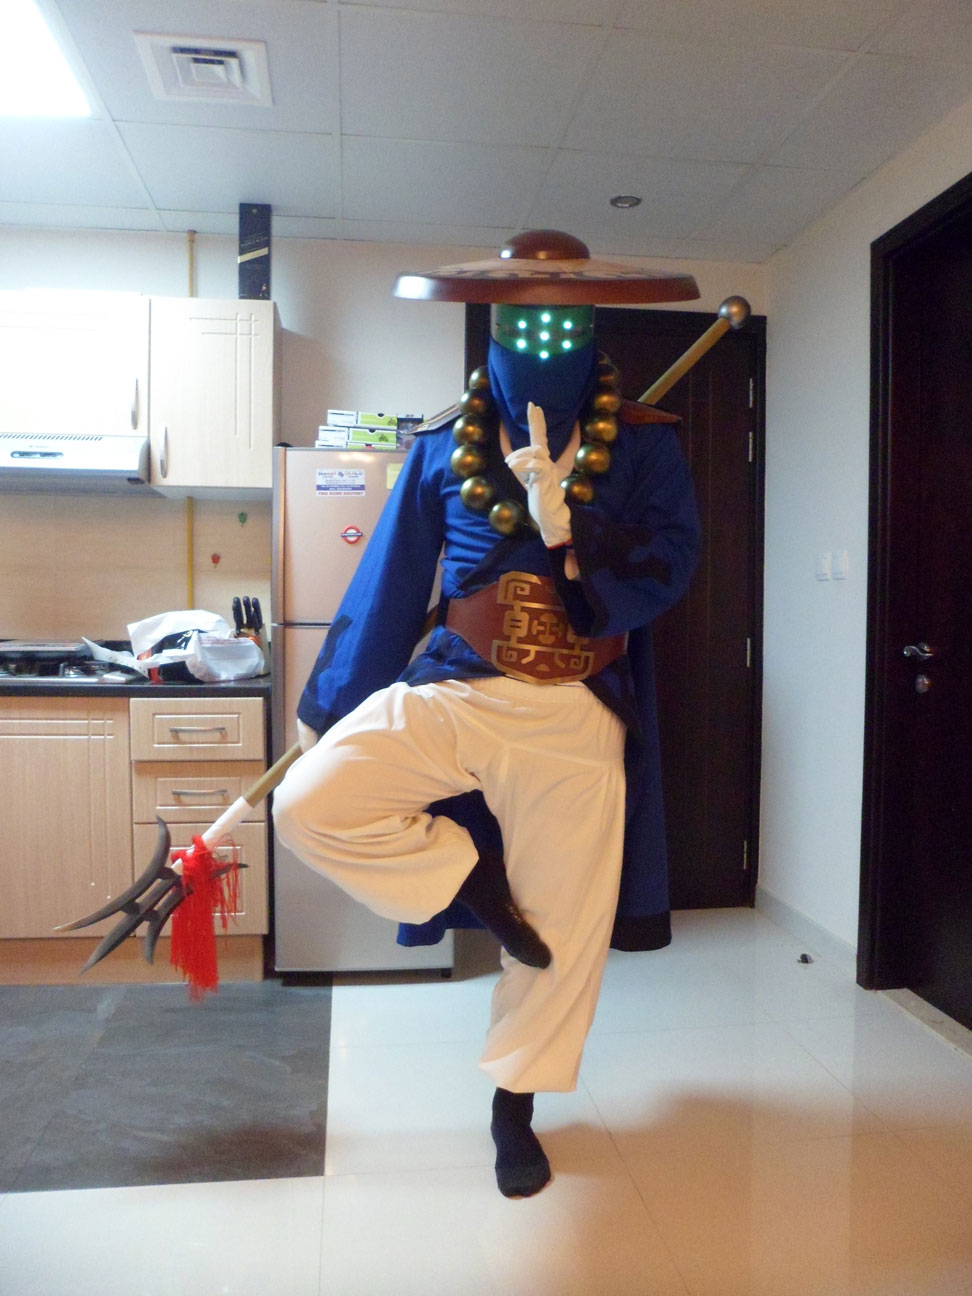 Figures - Costumes - Jax League Of Legends